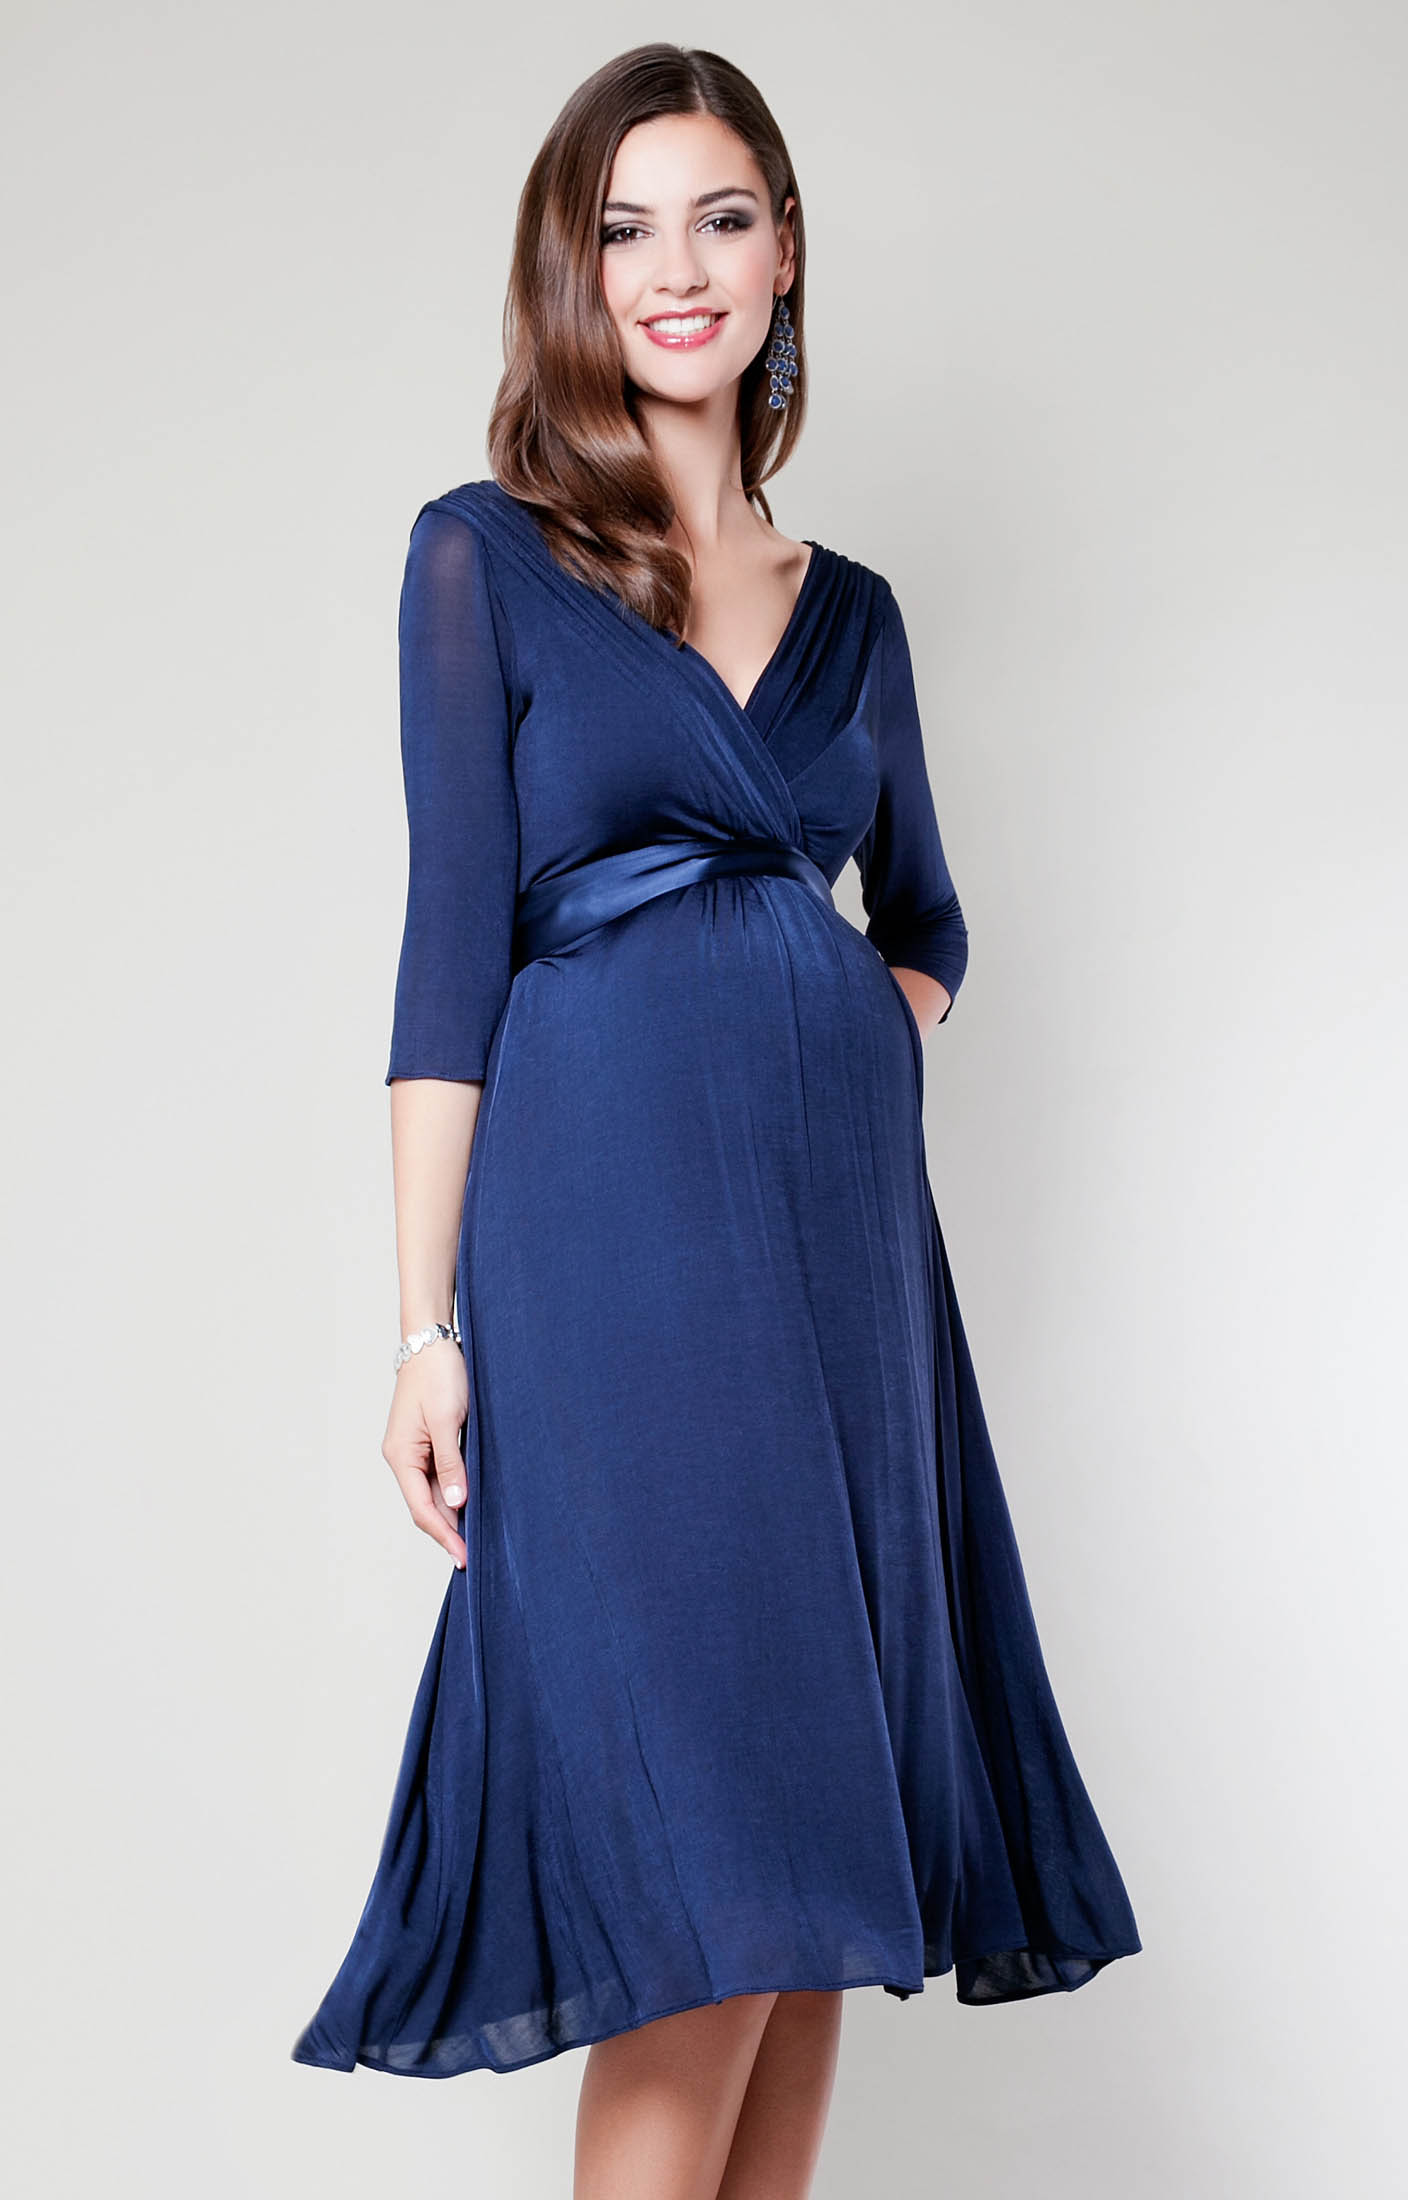 maternity wear willow maternity dress (midnight blue) by tiffany rose tkdazkq